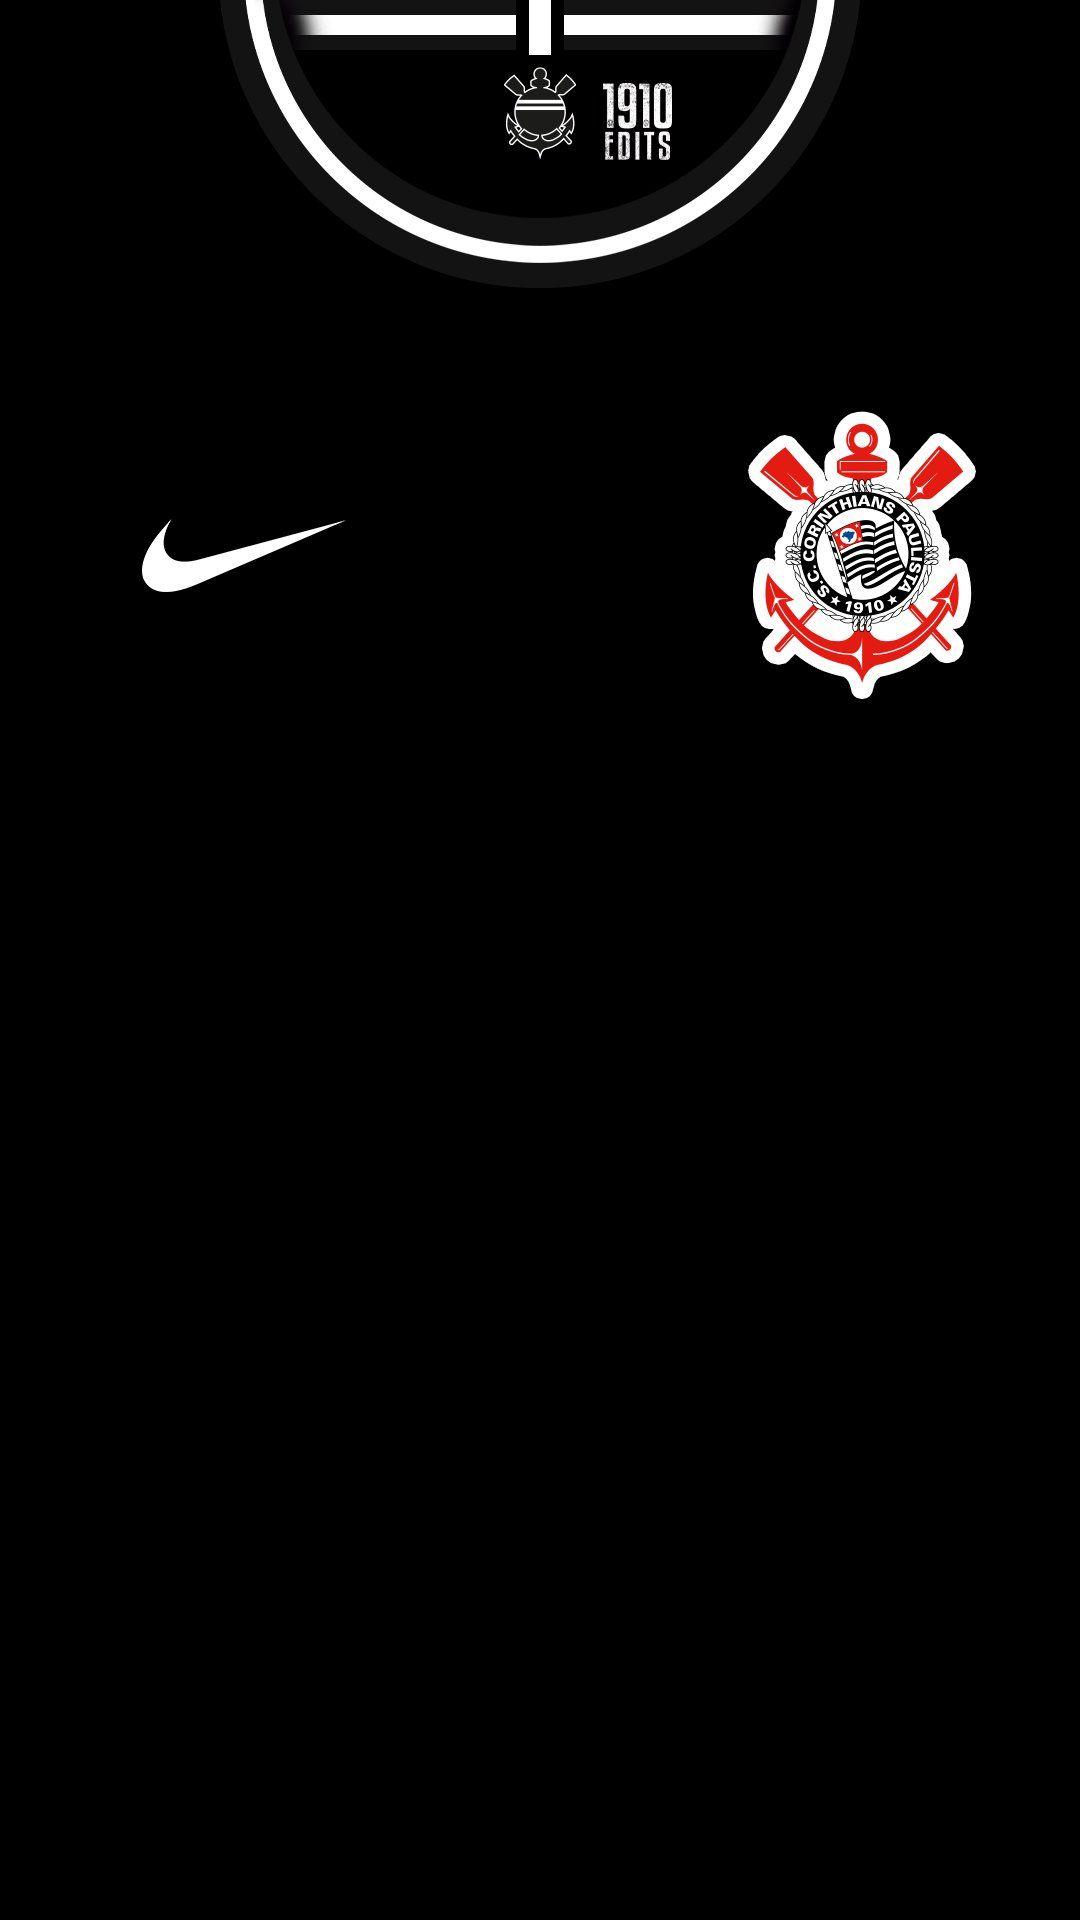 Wallpaper Corinthians In 2020 Soccer Kits Football Kits Soccer